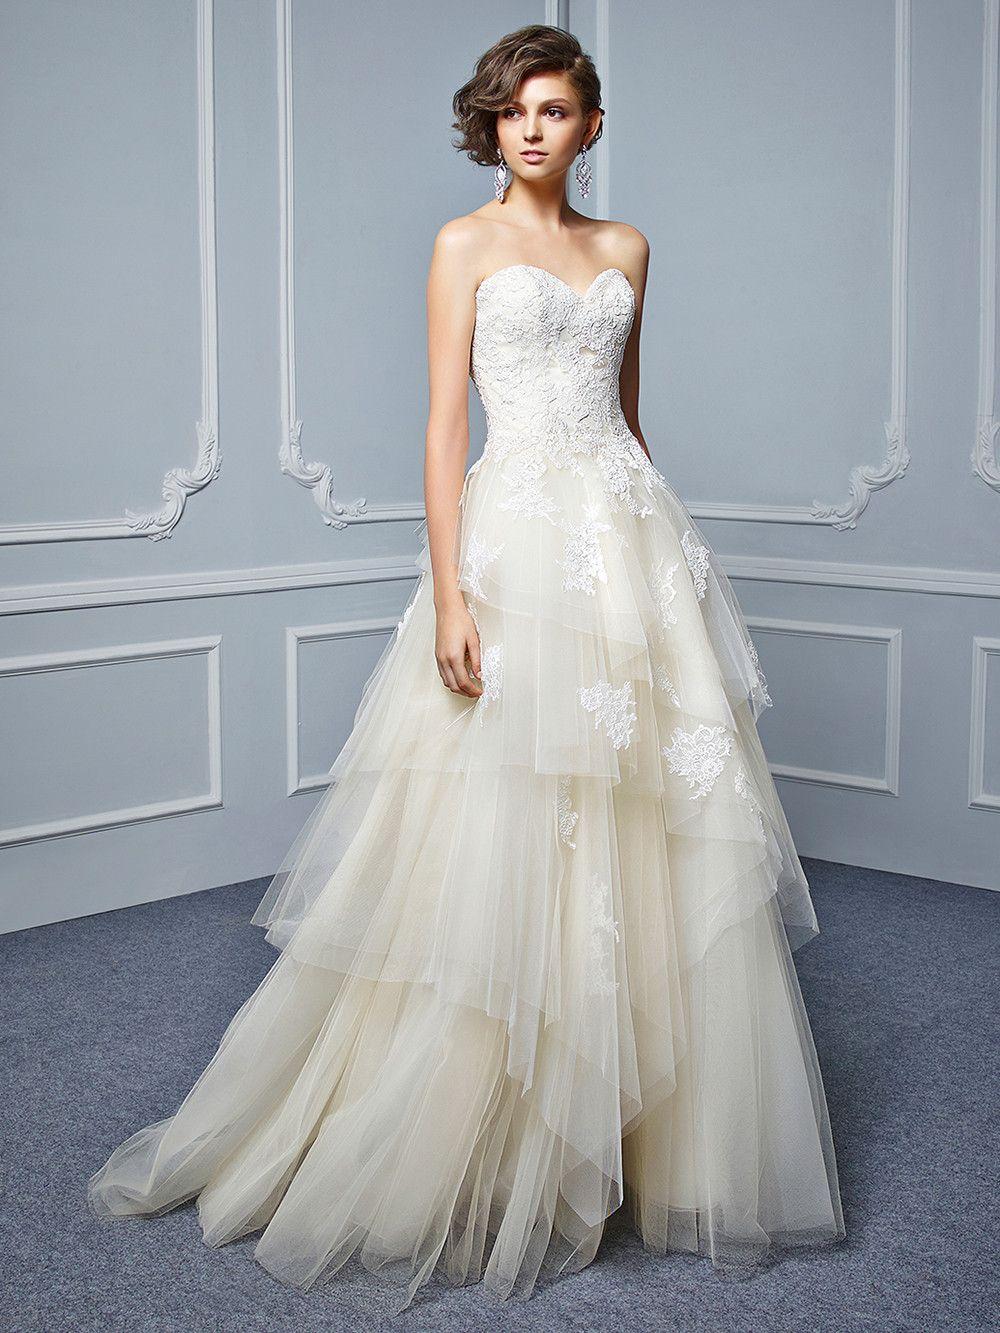 Pin by amanda guzman on that one day pinterest wedding dresses